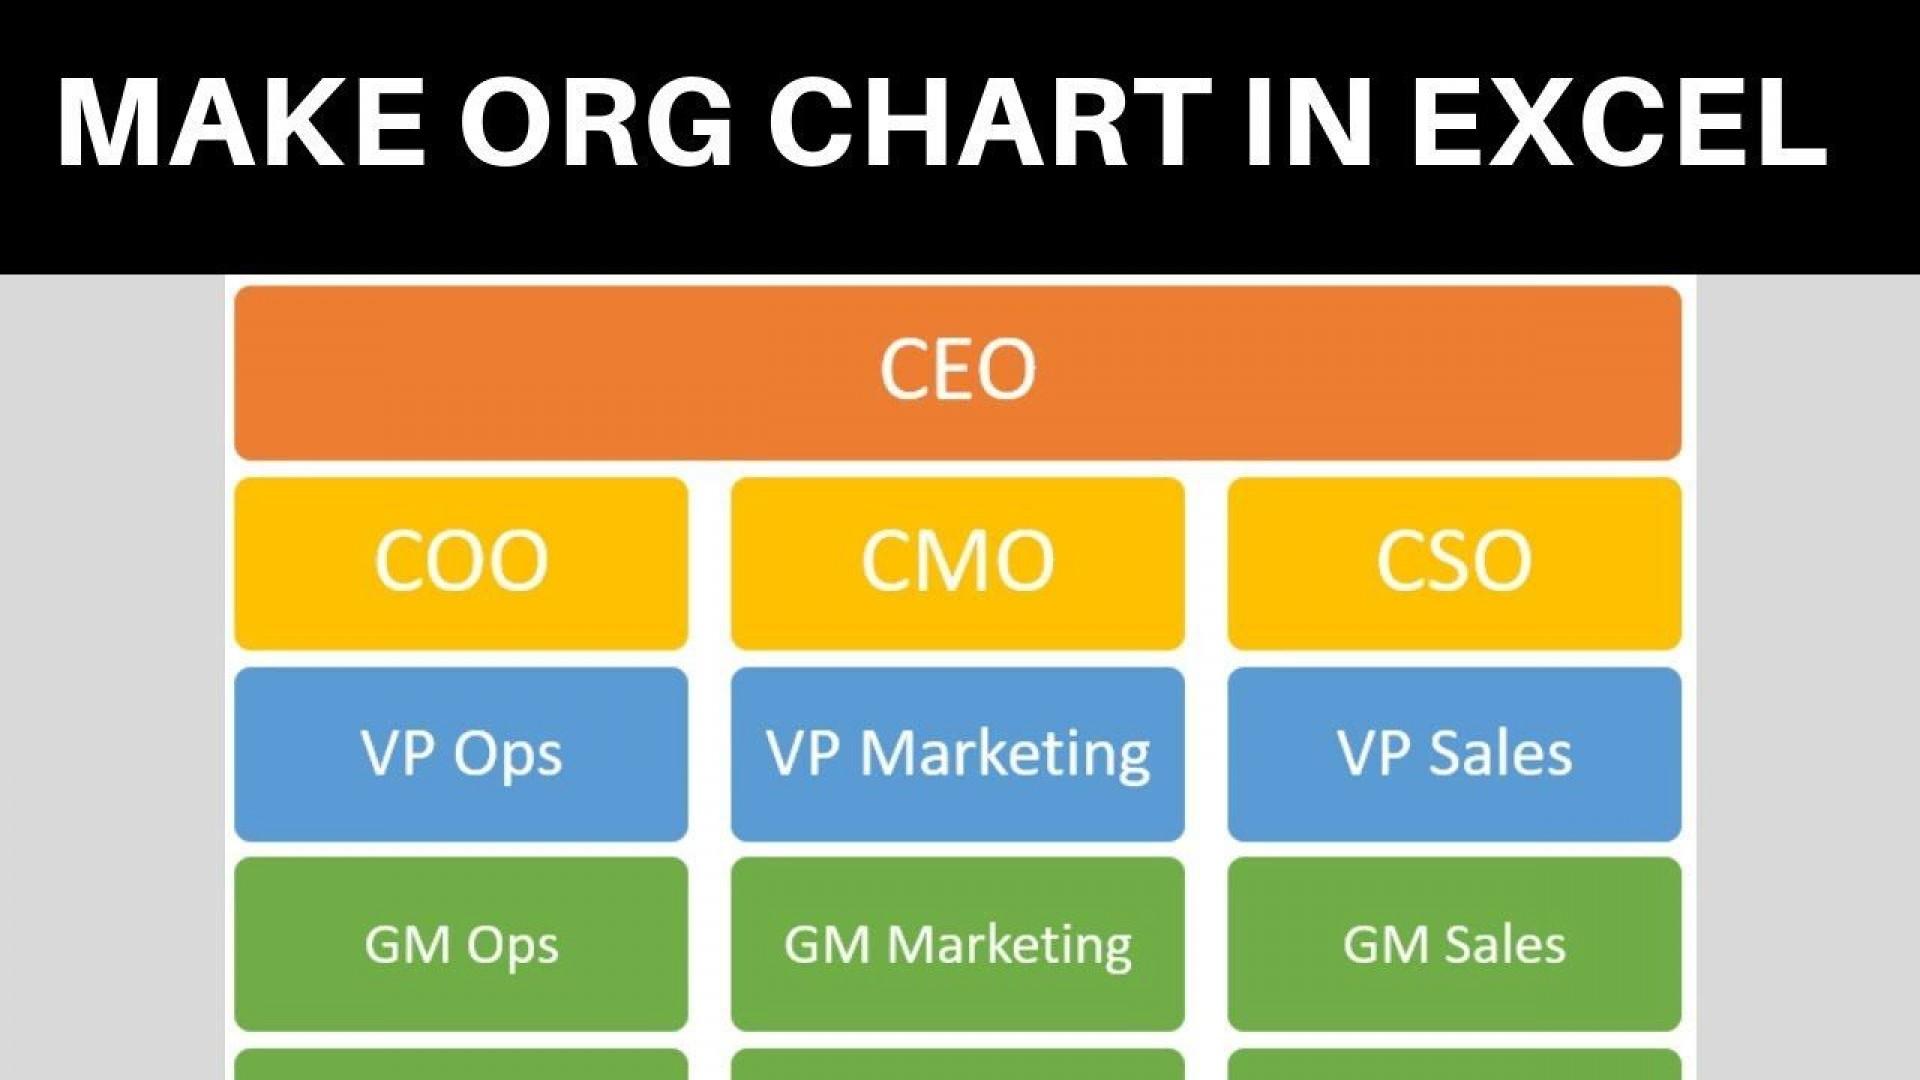 001 Stunning Org Chart Template Excel 2013 Inspiration  Organizational1920